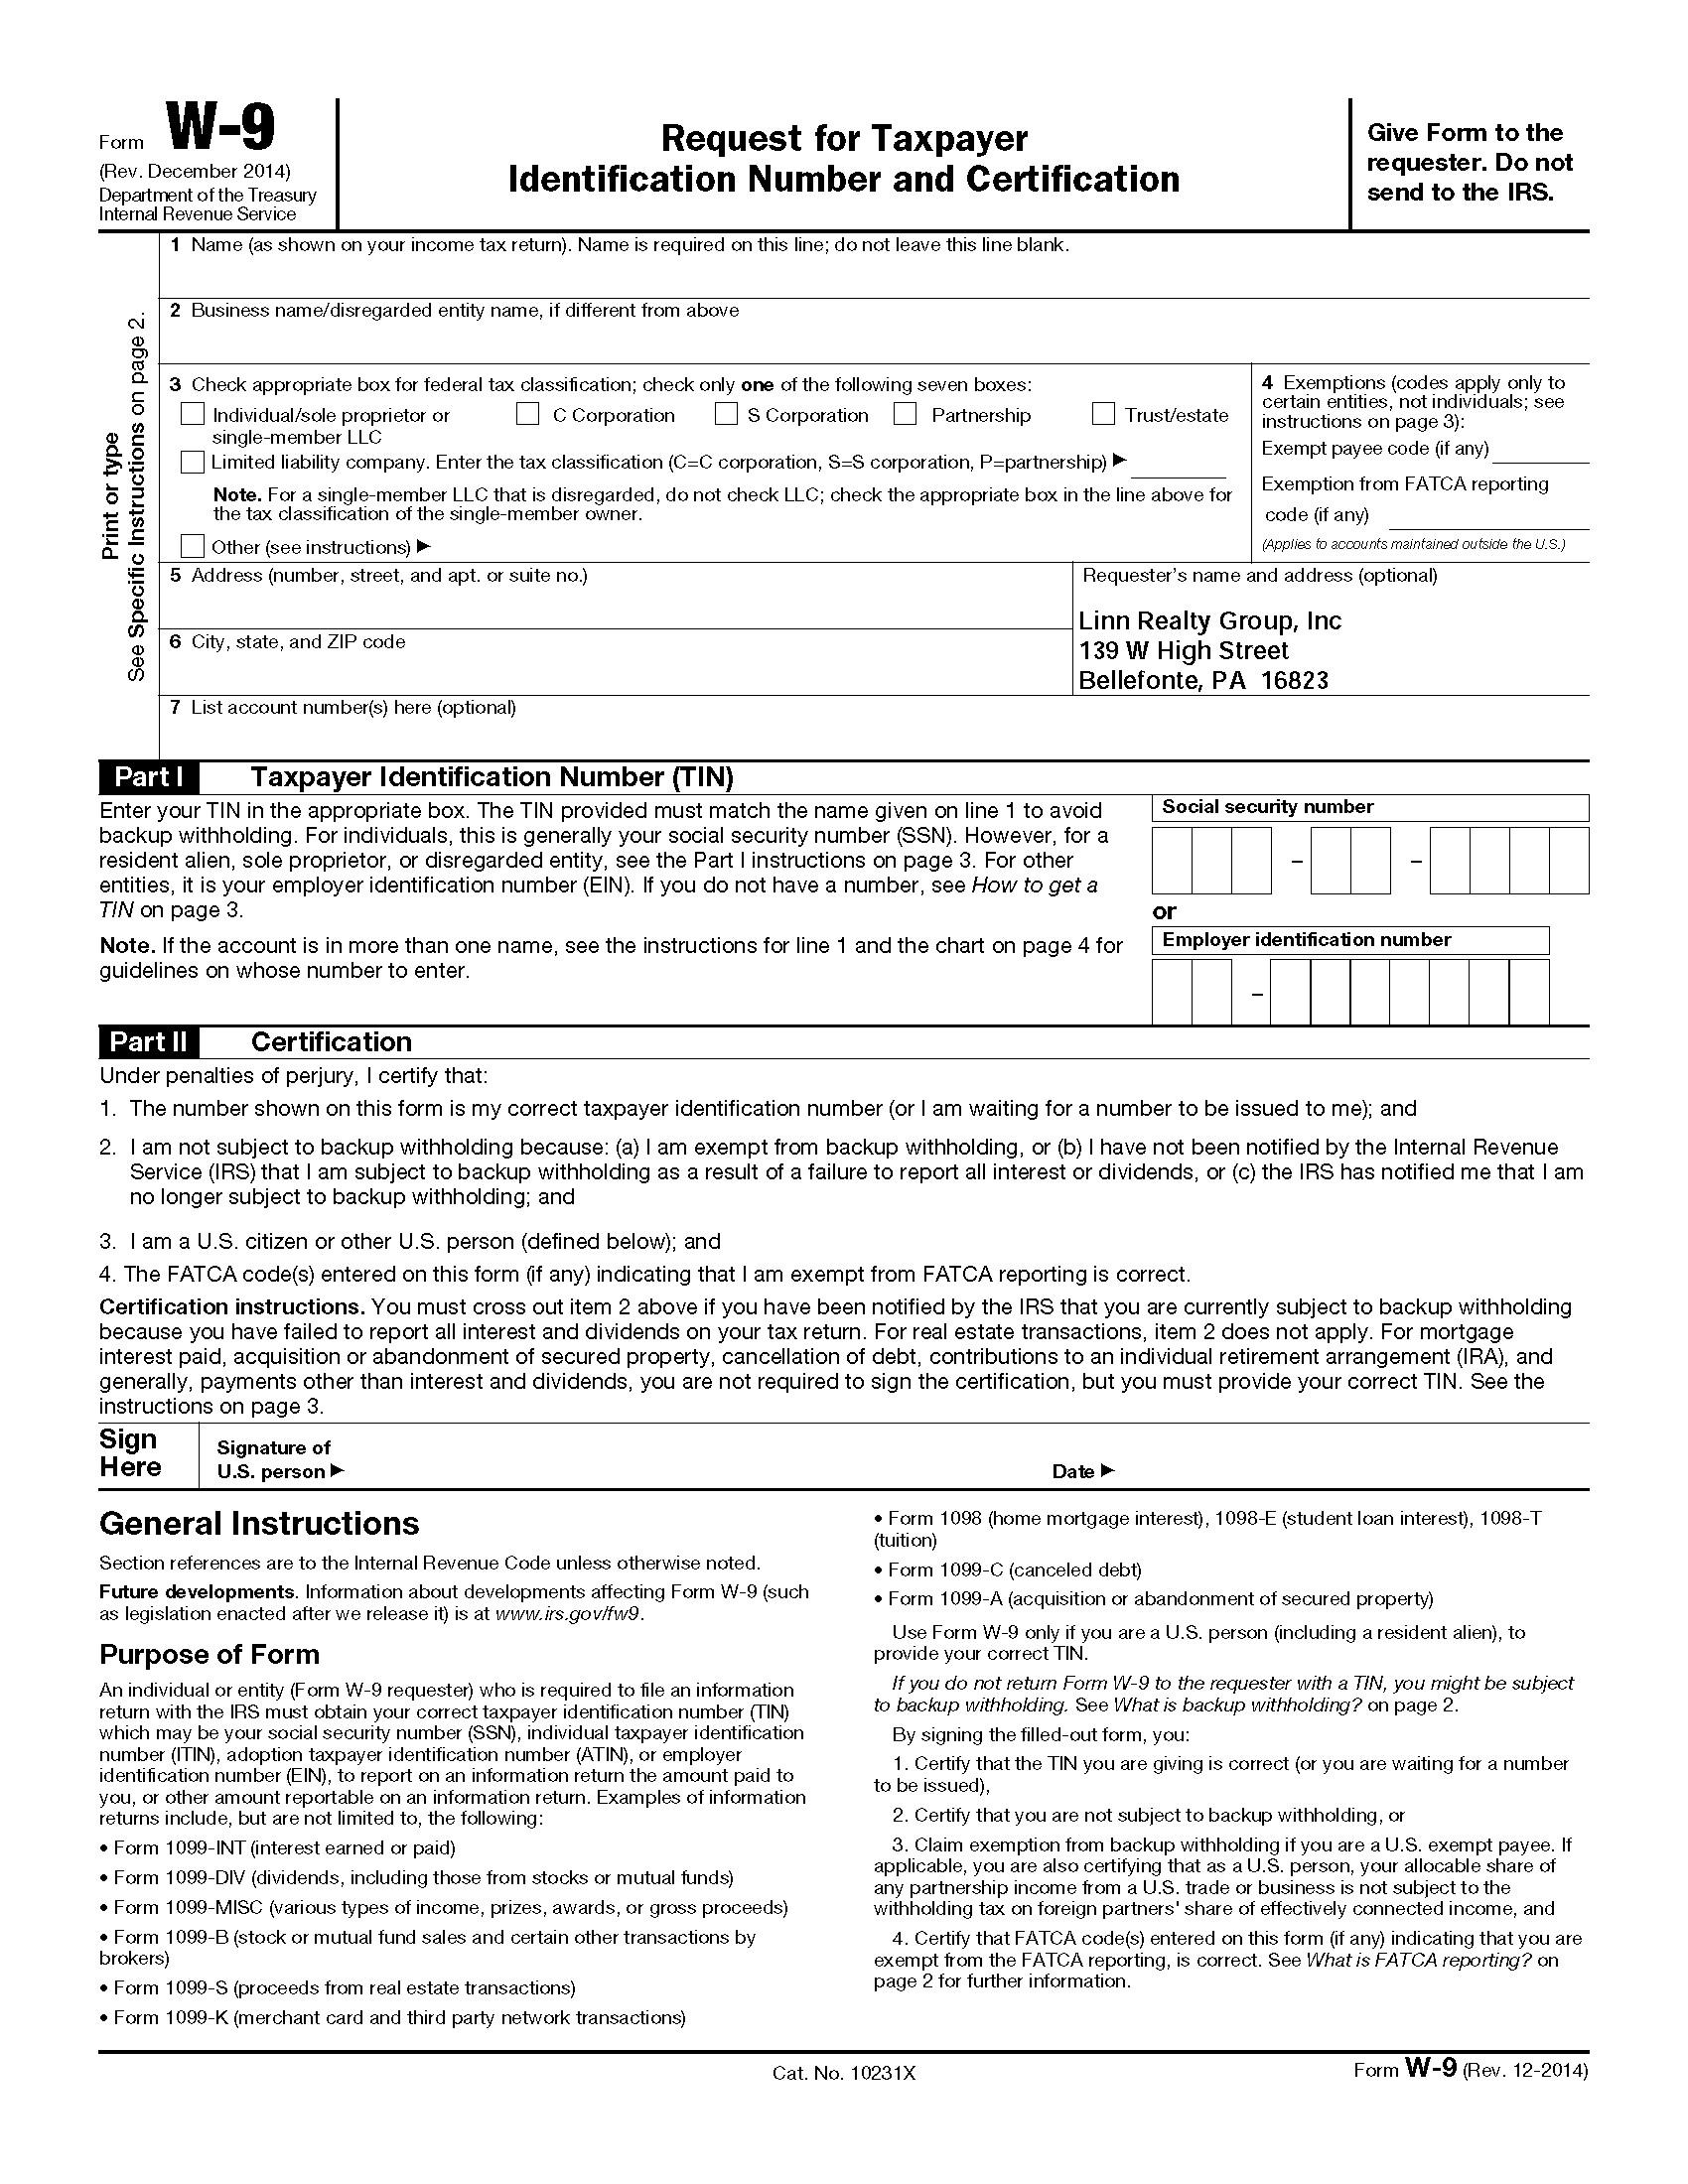 Blank 2019 W 9 Form Printable | Calendar Template Printable-Blank Printable W-9 Form 2020